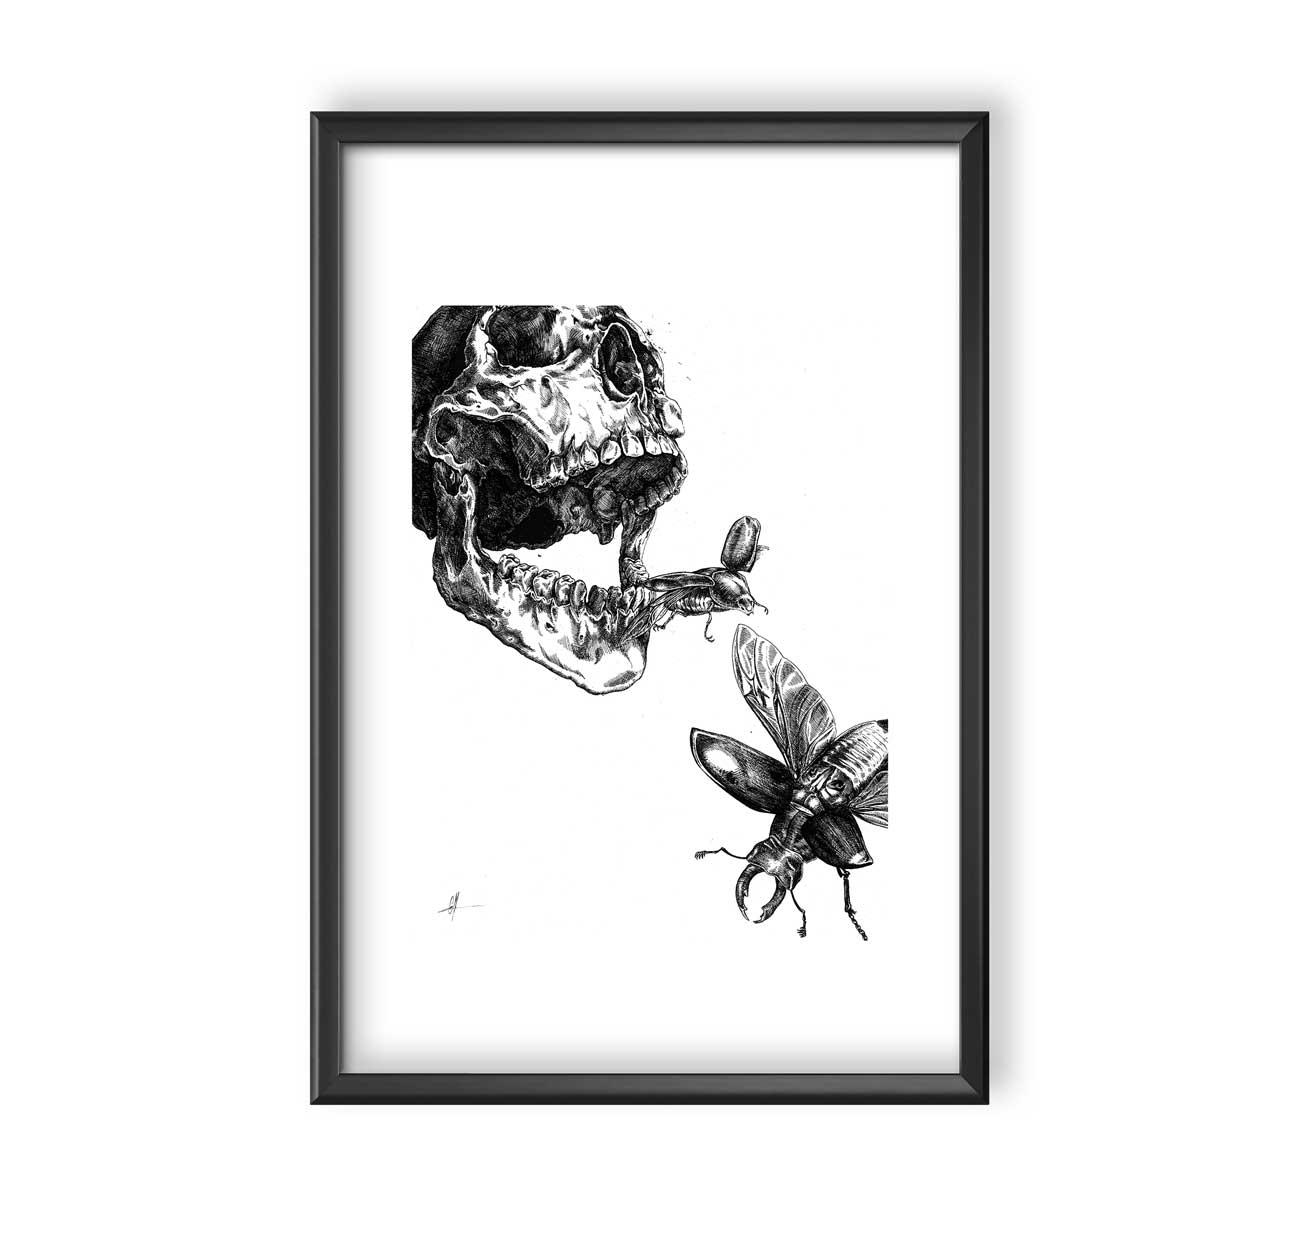 Entomophage-Camille-Murgue